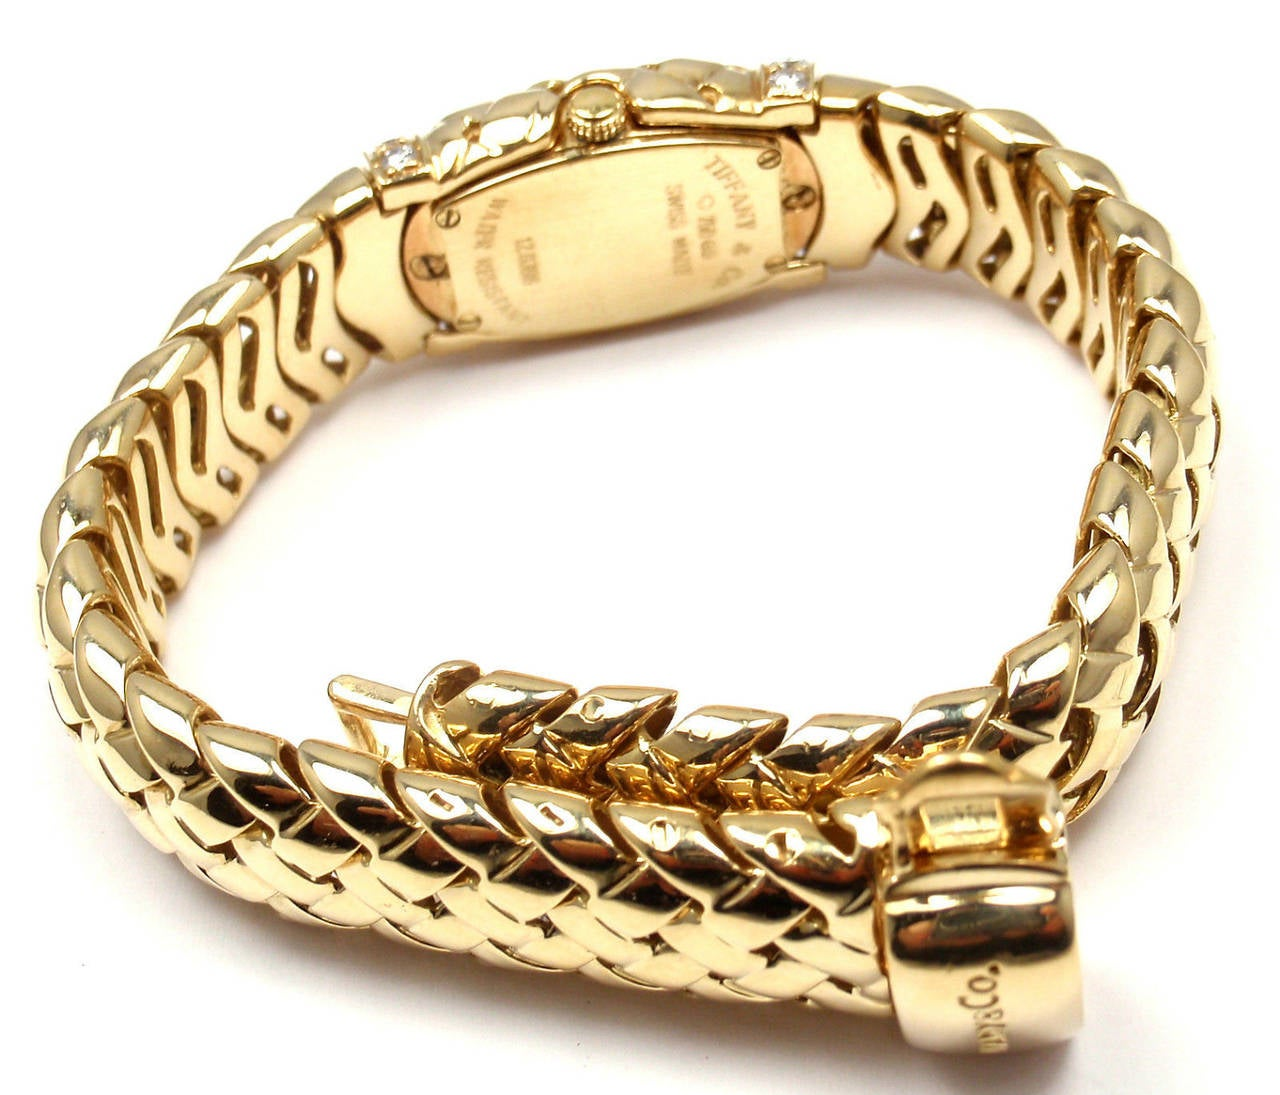 Tiffany & Co. Lady's Yellow Gold Diamond Basket Weave Quartz Wristwatch 3